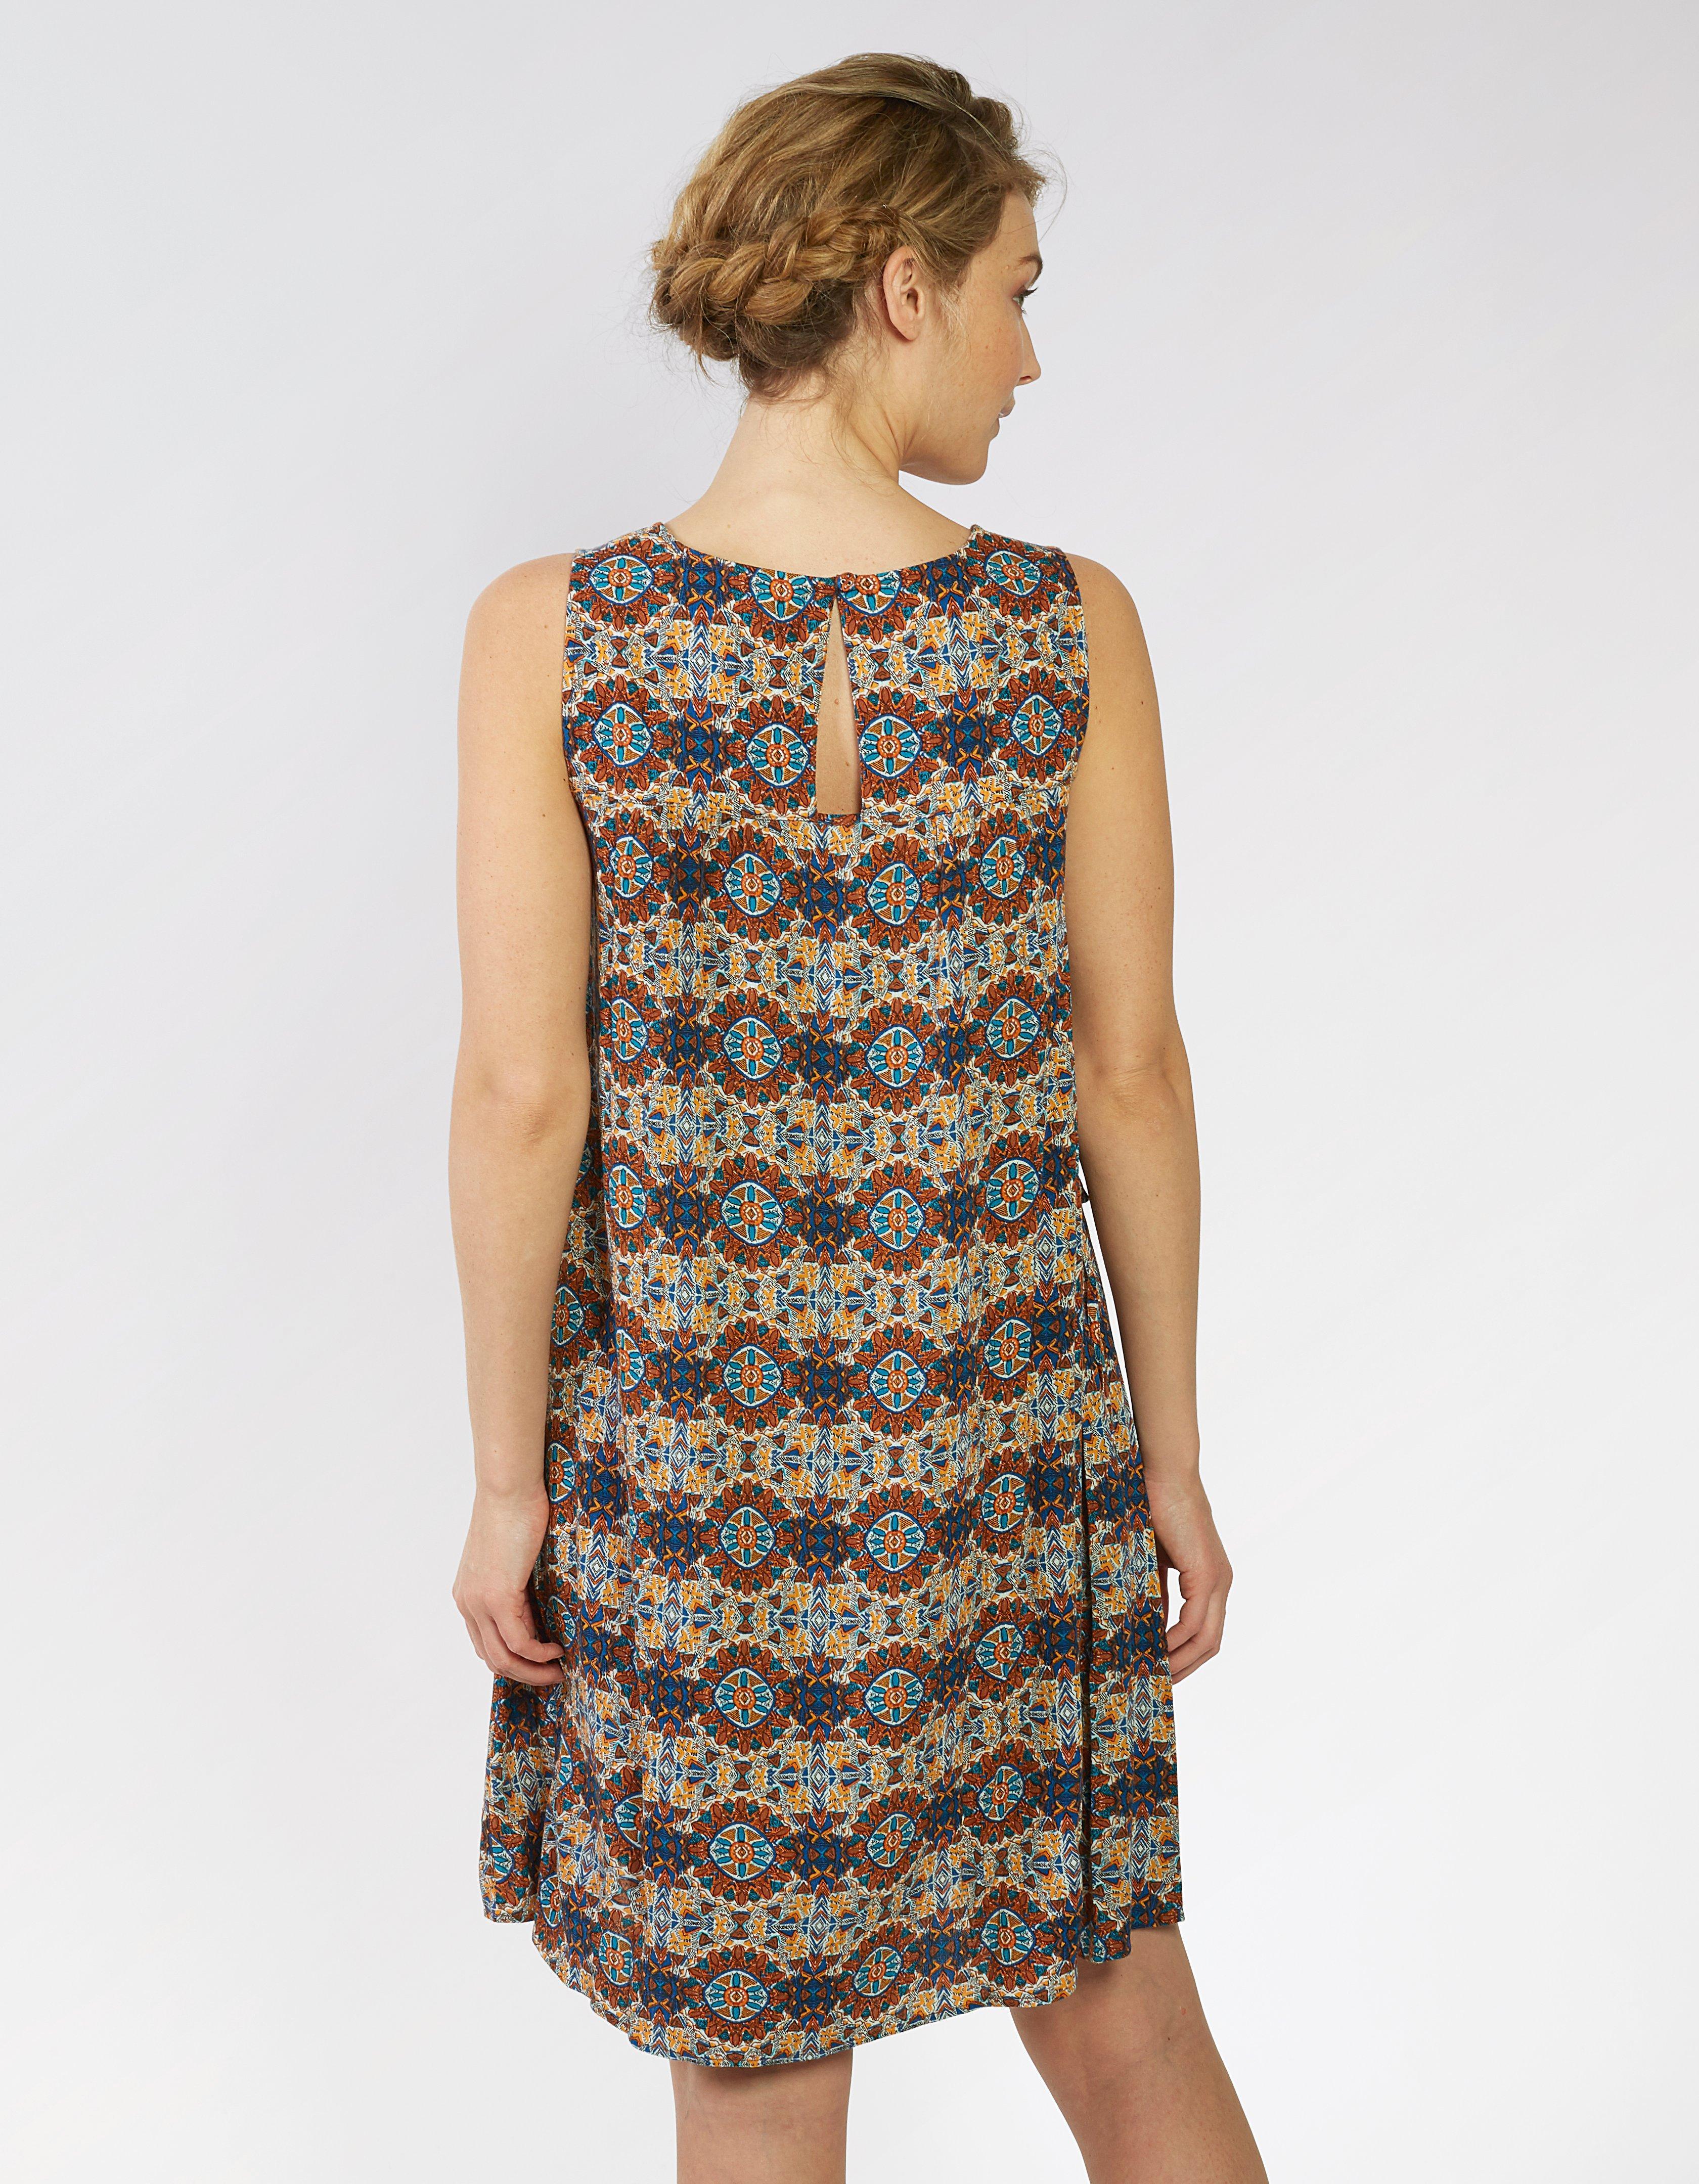 Alison Kaleidoscope Dress